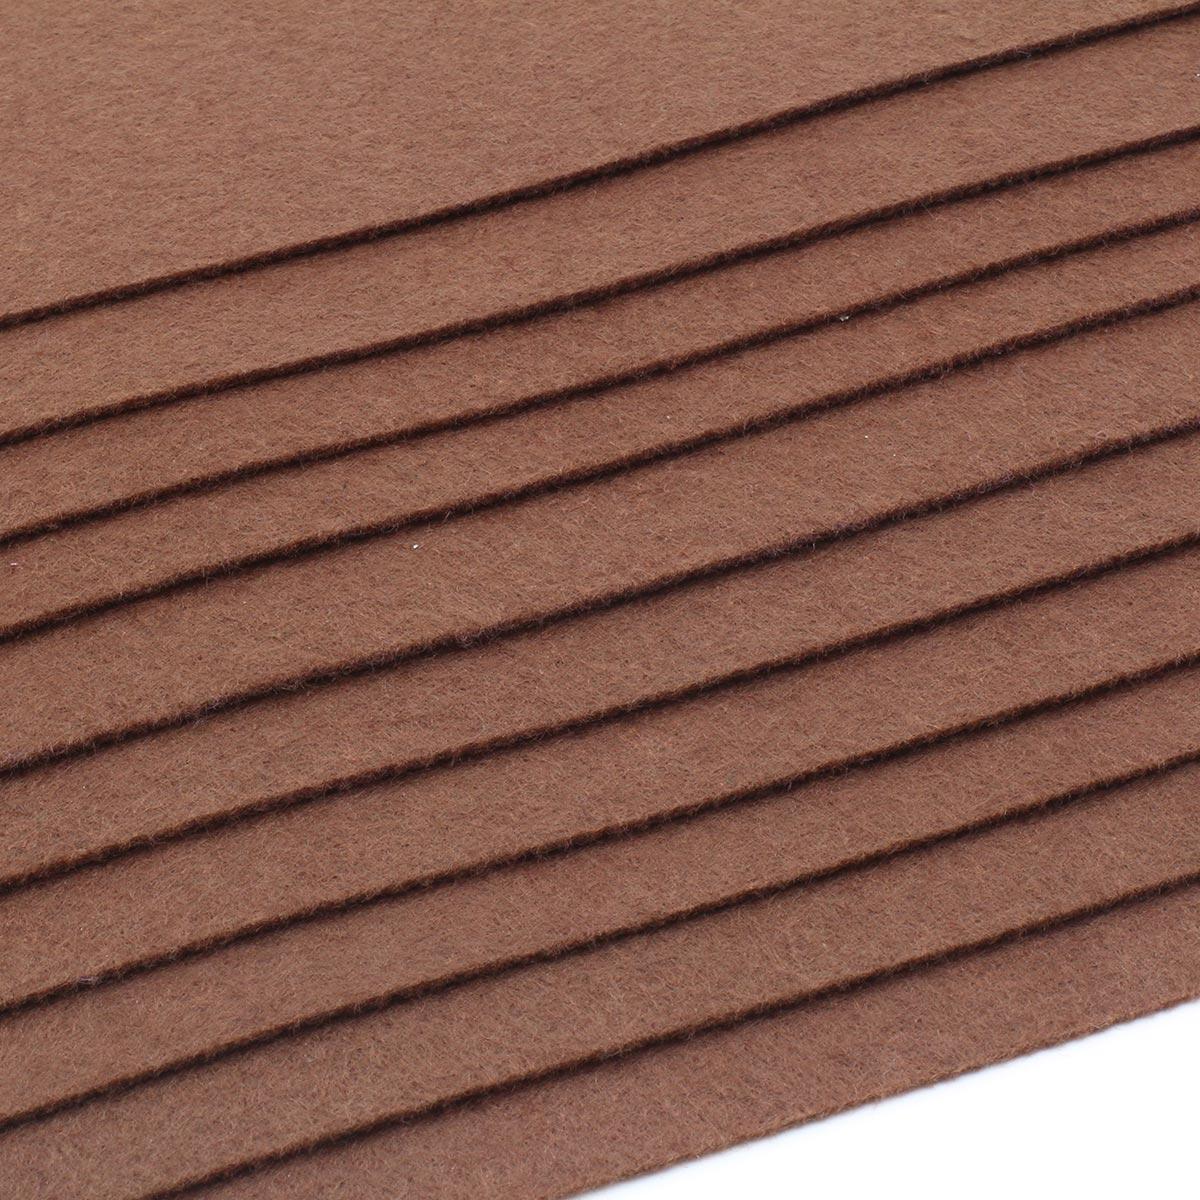 Фетр листовой Астра, 1,0мм, 180 гр, 20х30см, 10 шт/упак